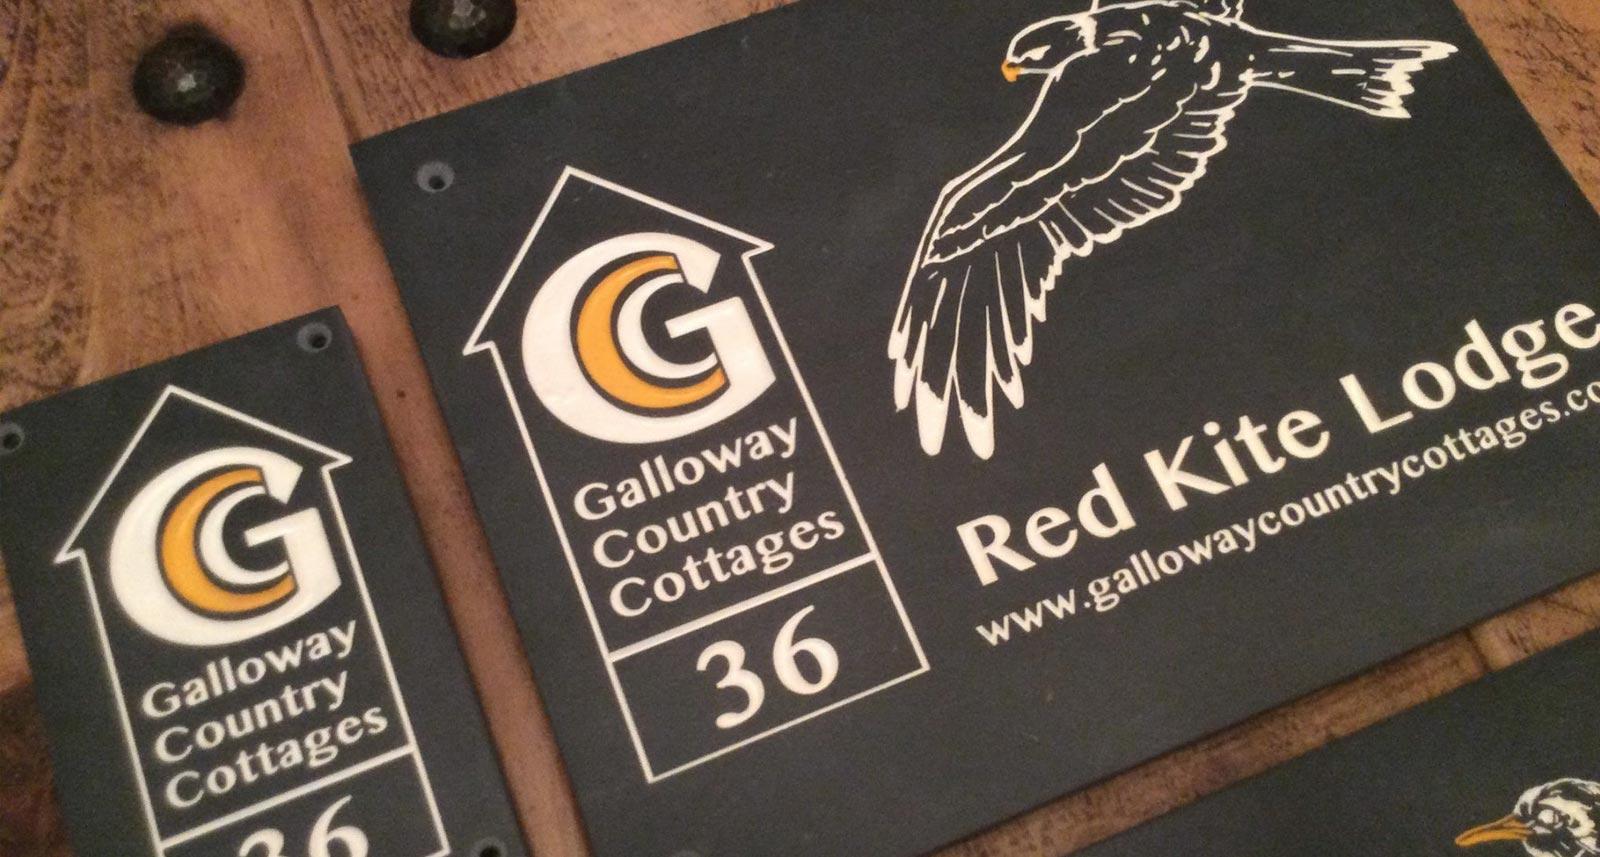 House Signs In Slate - Web Designers Torquay Devon